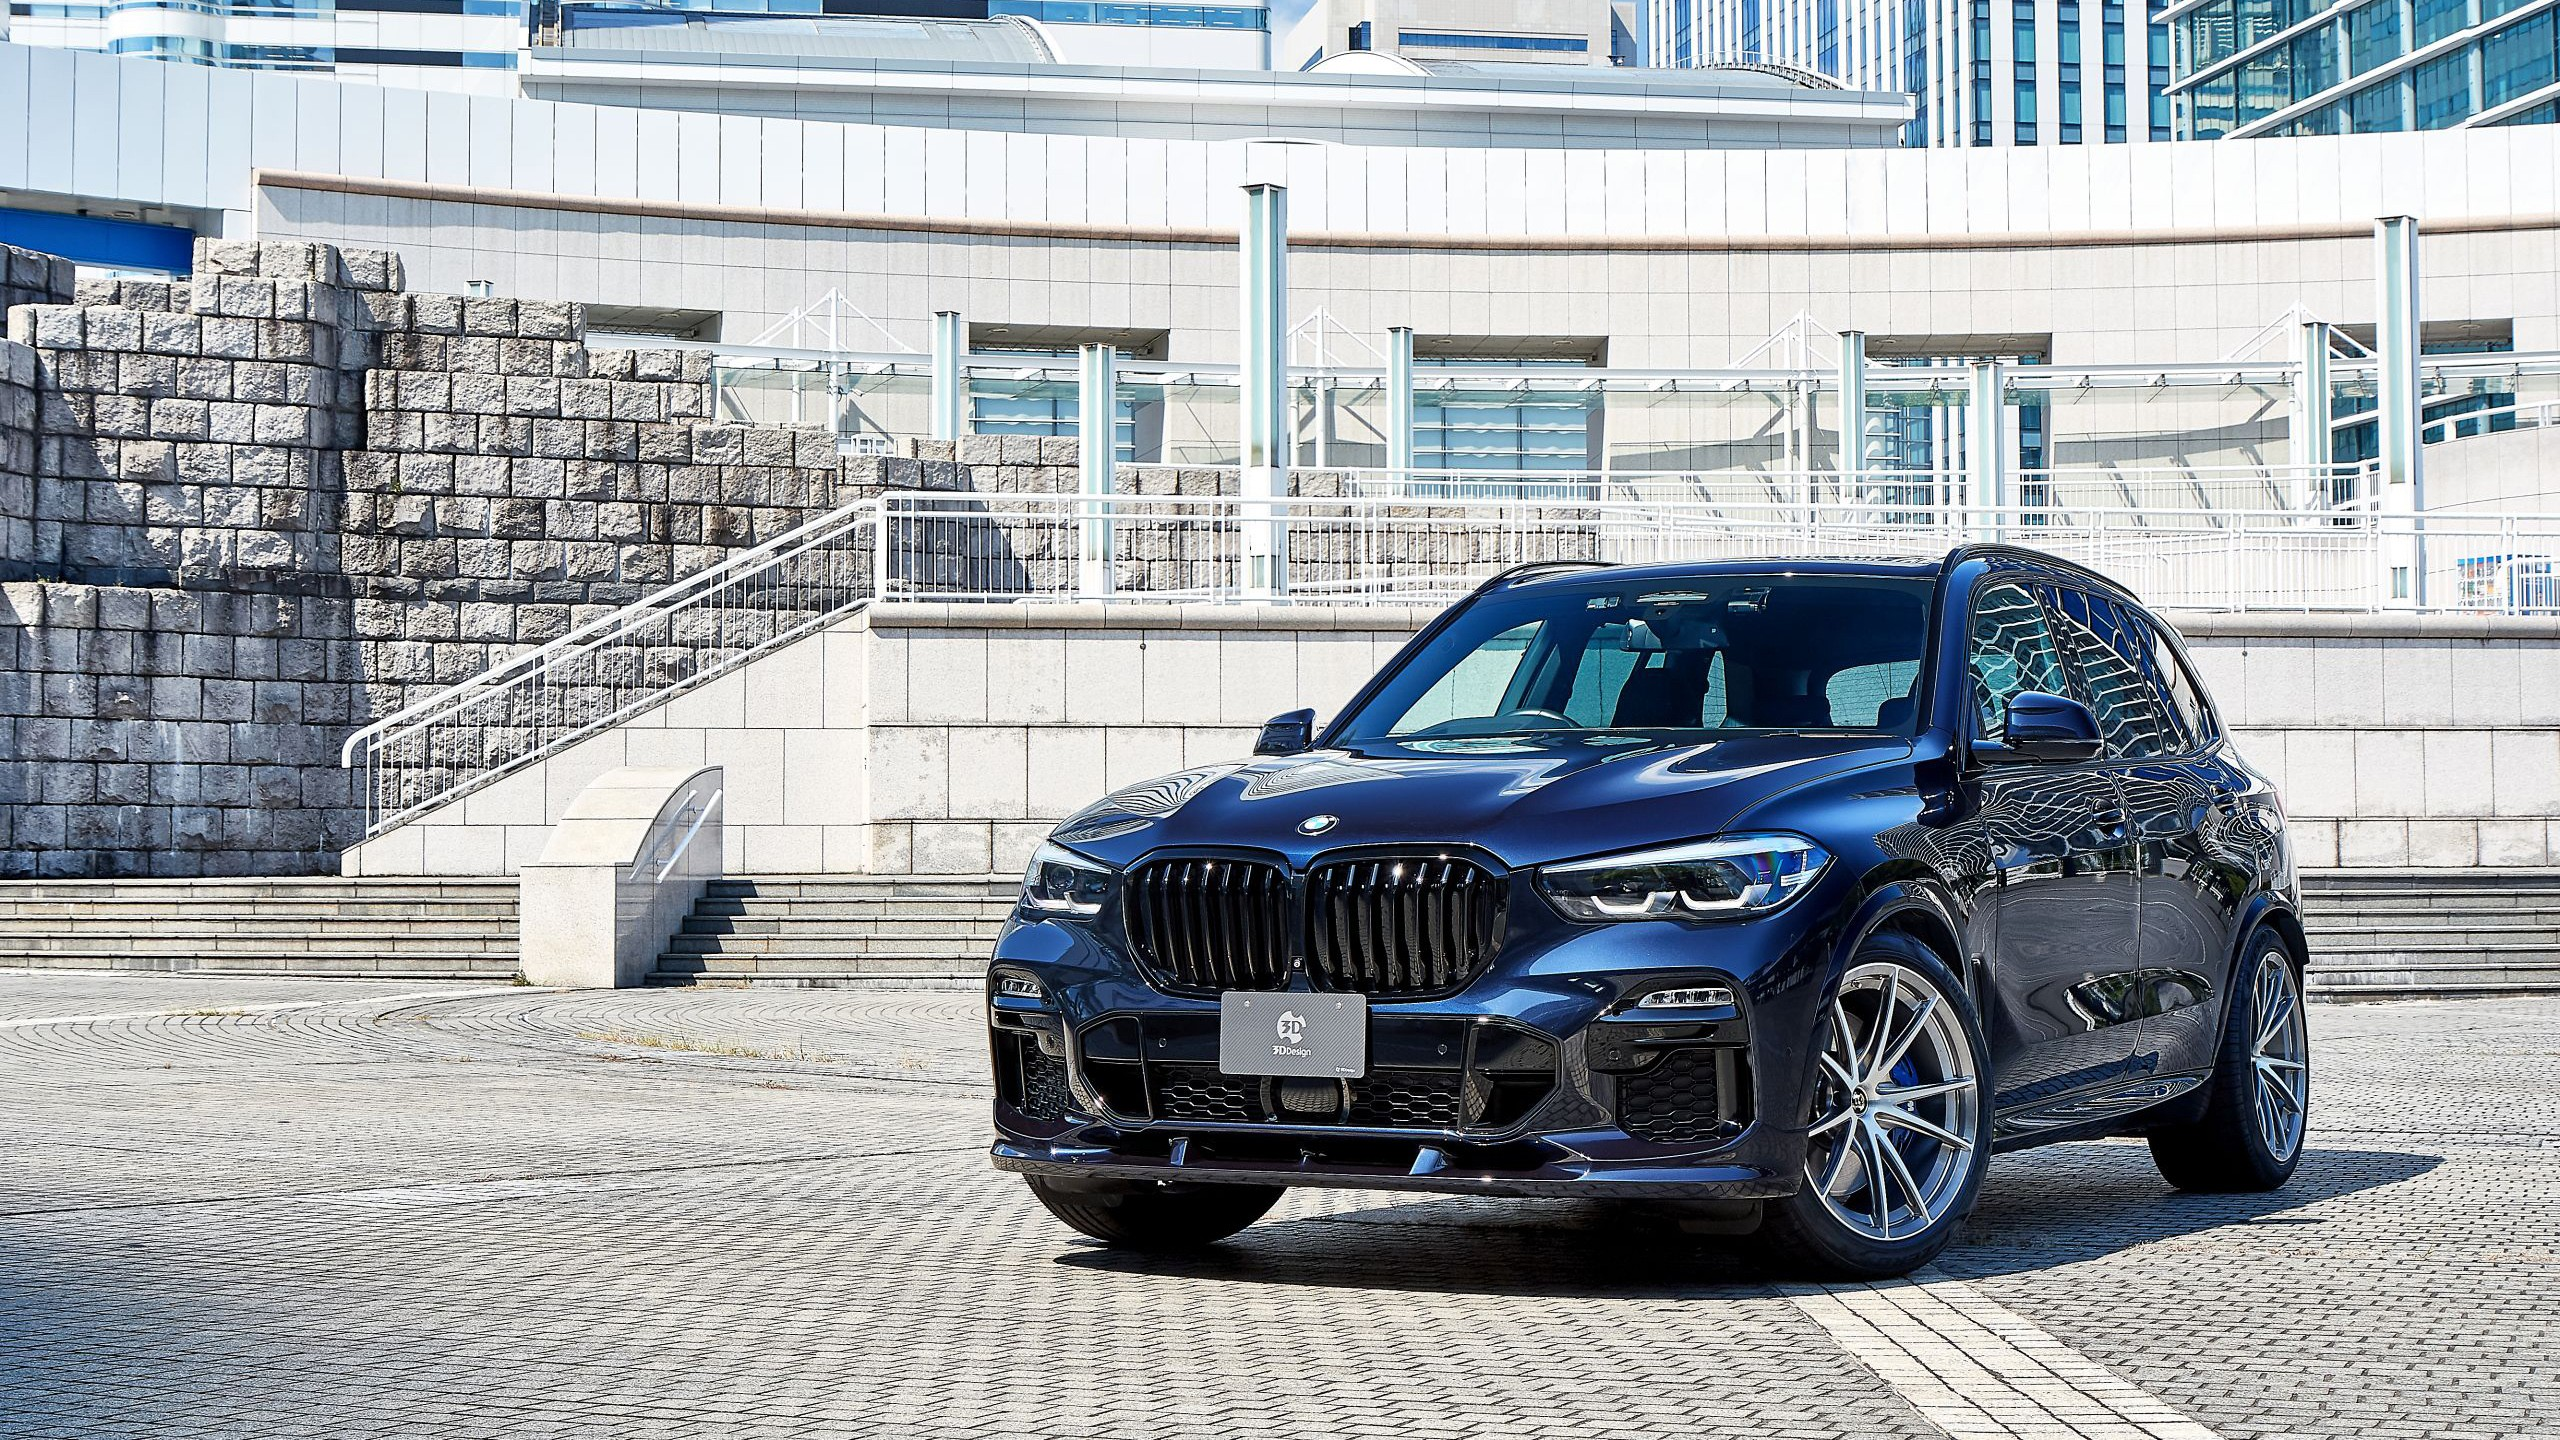 3D Design BMW X5 2020 Wallpaper | HD Car Wallpapers | ID ...